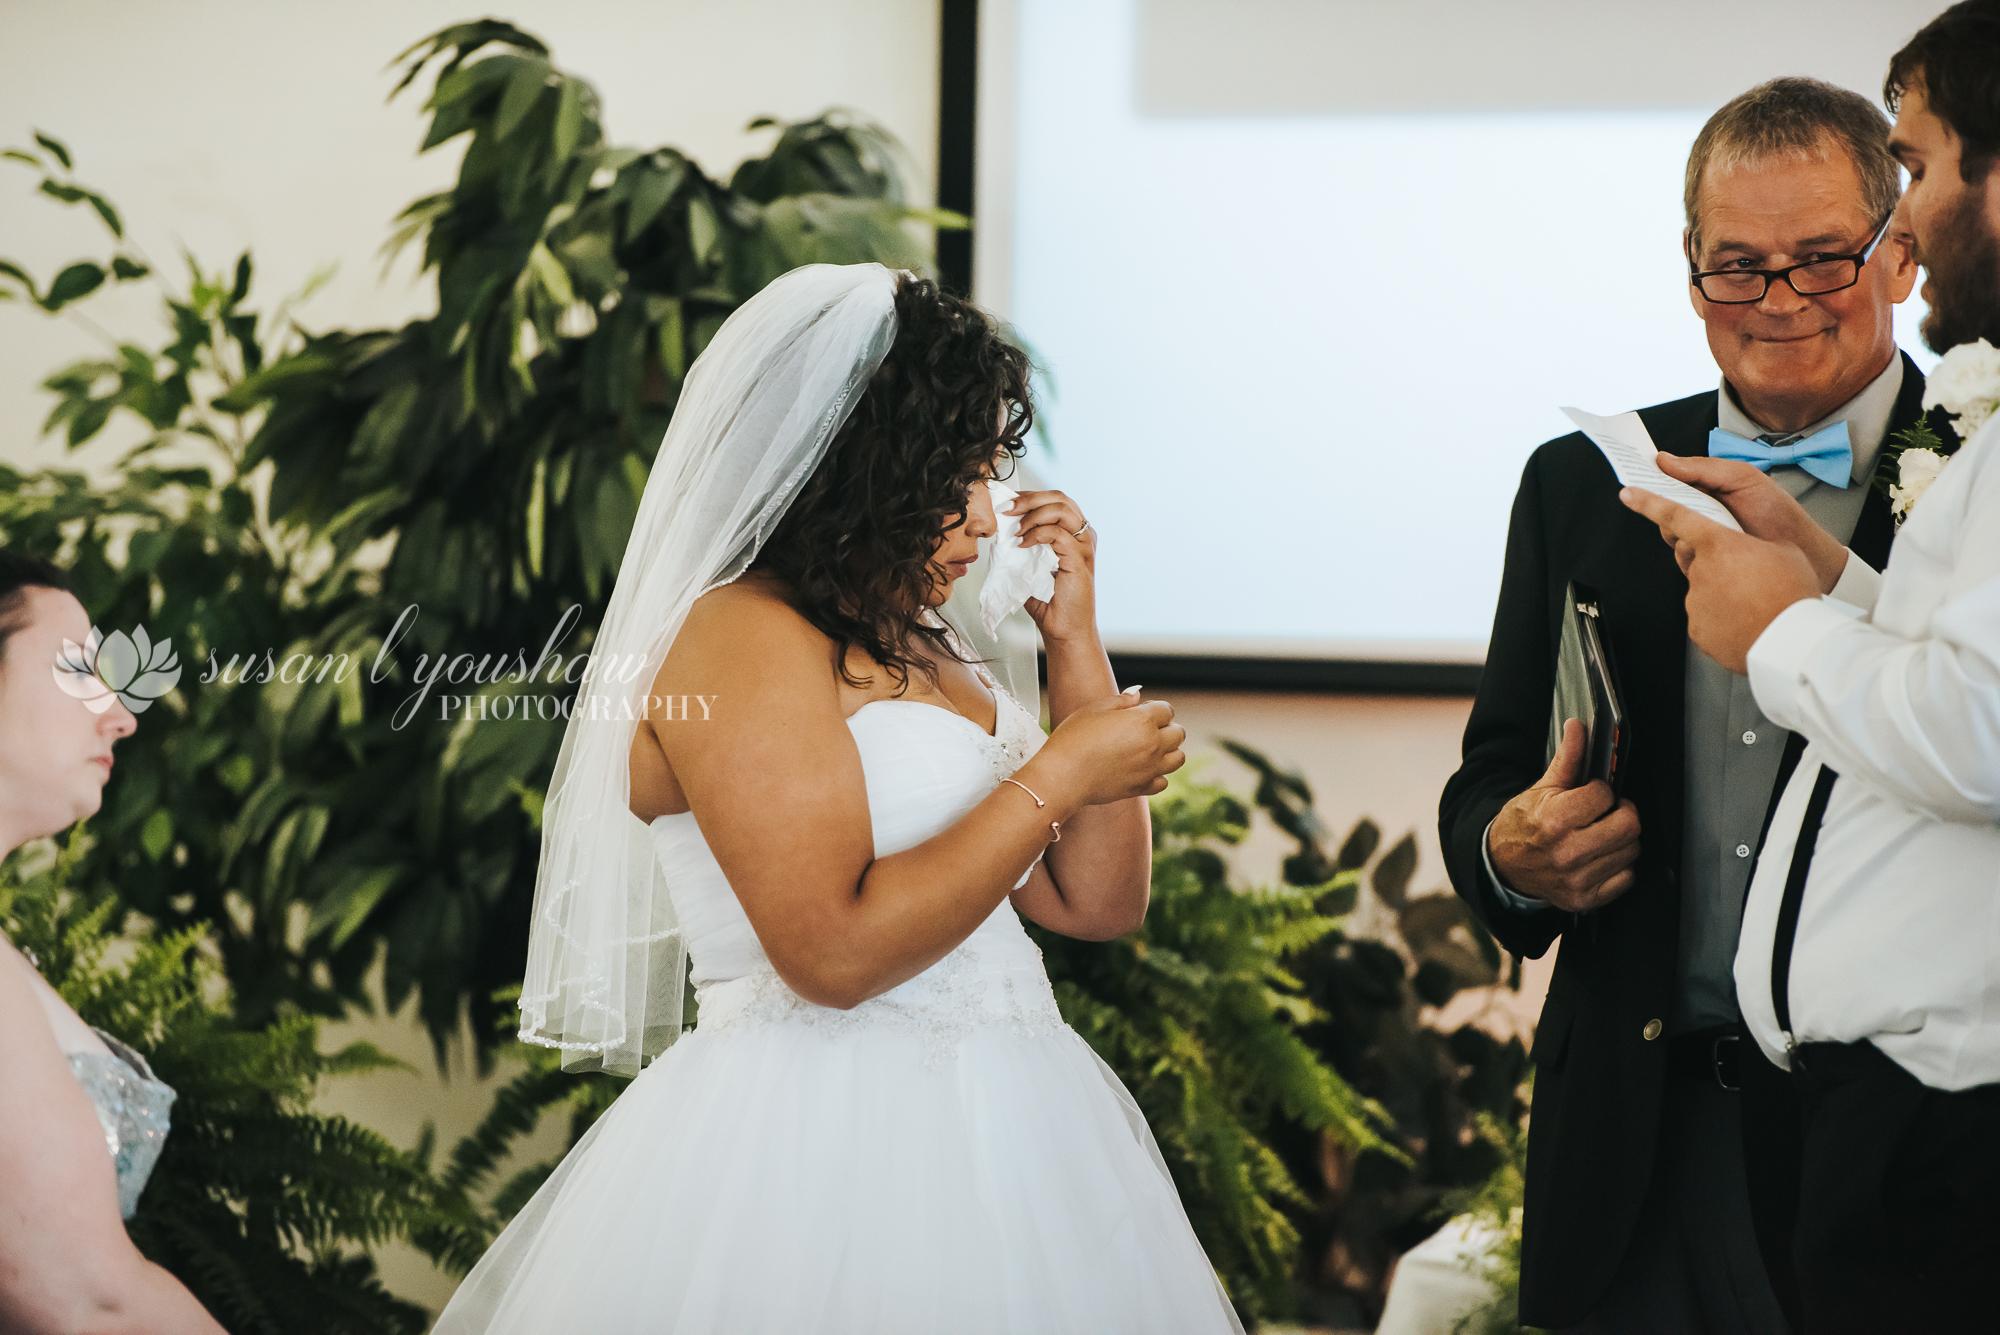 Katelyn and Wes Wedding Photos 07-13-2019 SLY Photography-69.jpg